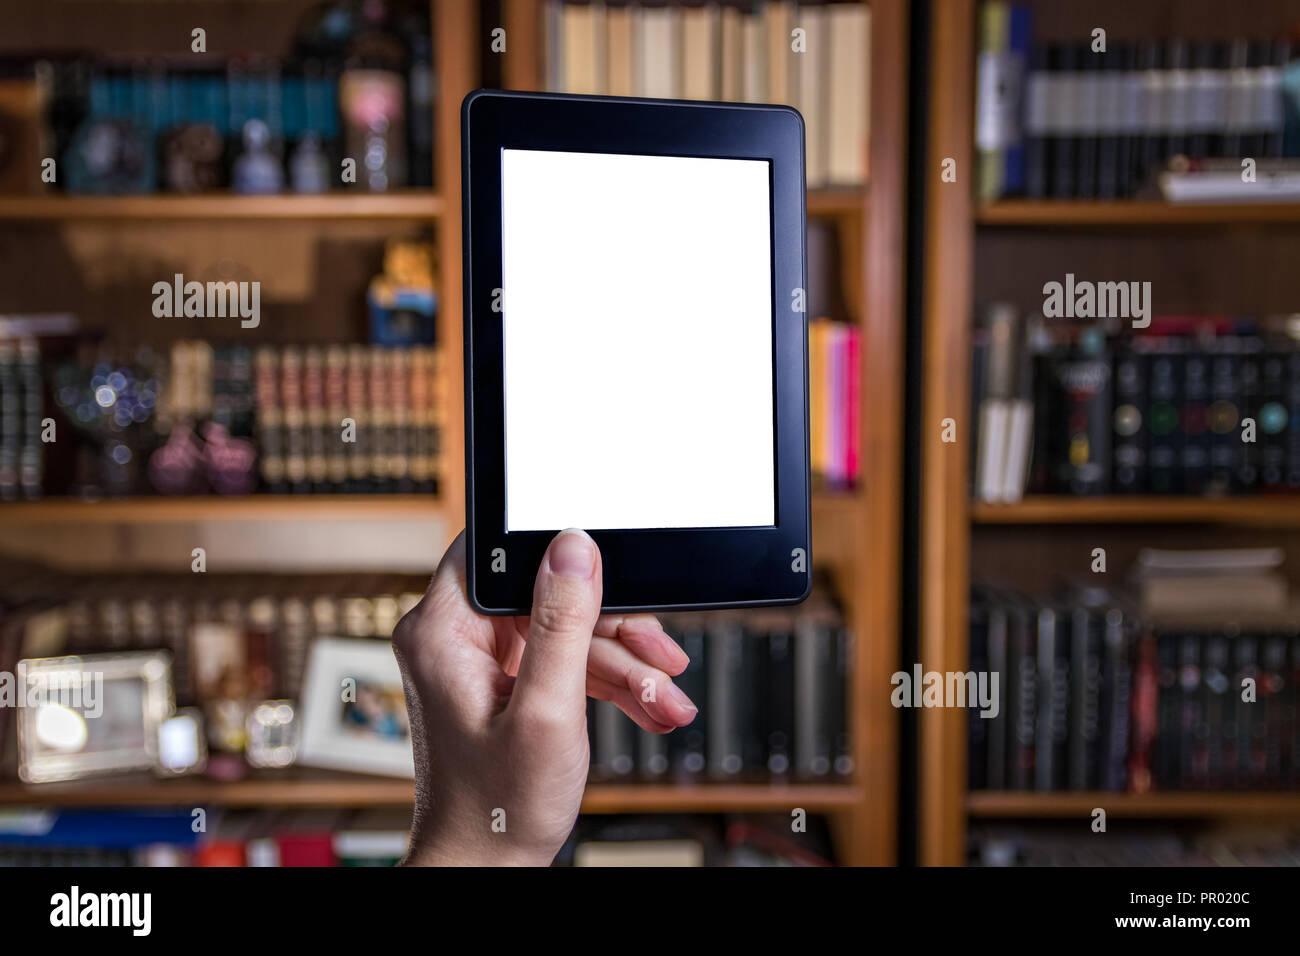 Womand hand holding e reader en face d'étagères Photo Stock